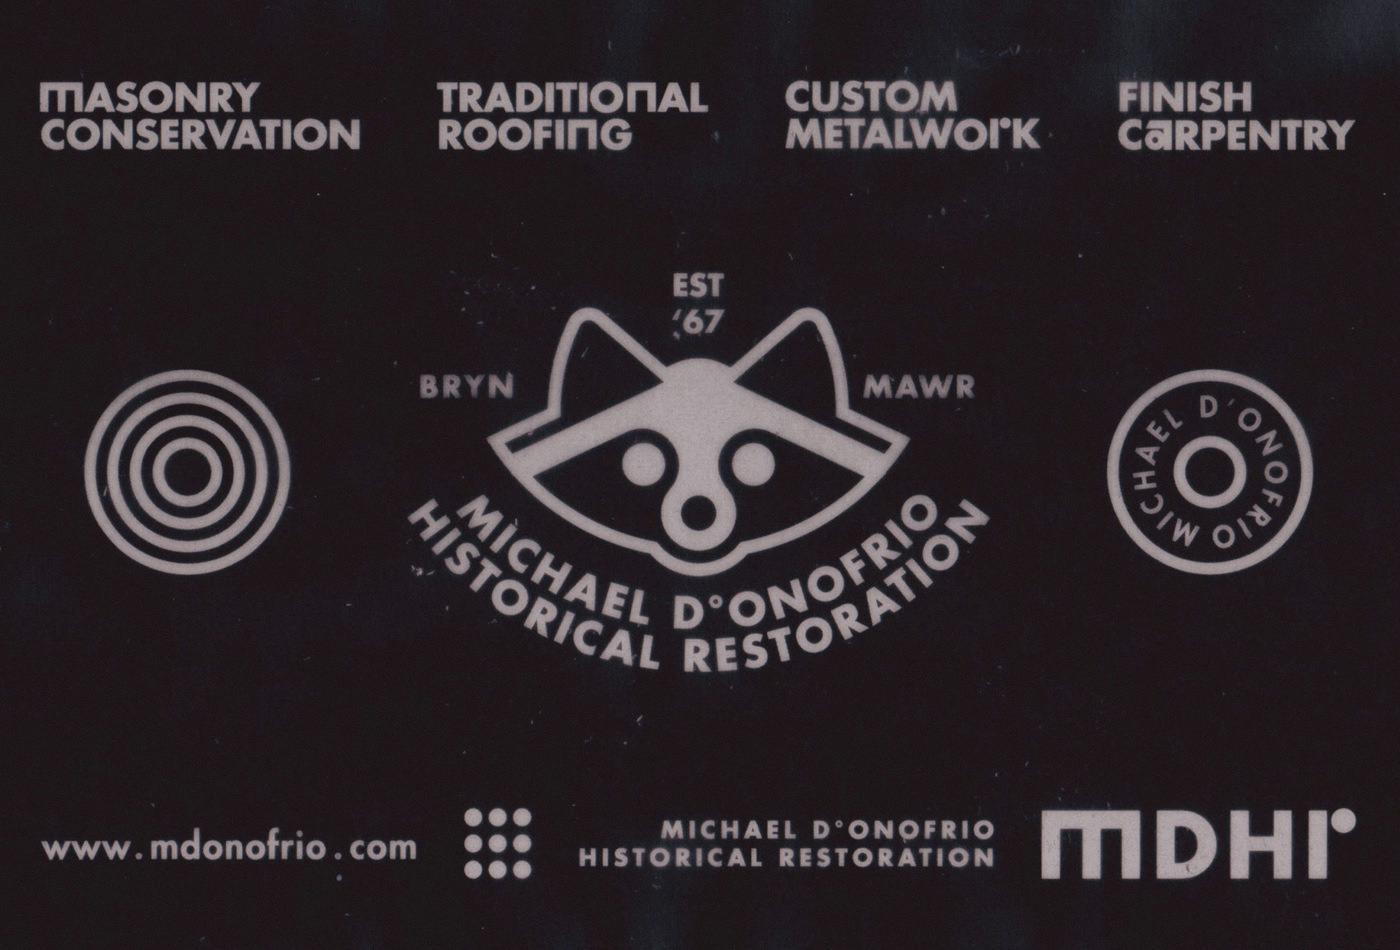 mdhr-historical-restoration-donofrio-michaeldonofrio-vacaliebres-markdonofrio-philly-mainline-raccoon-mascot-